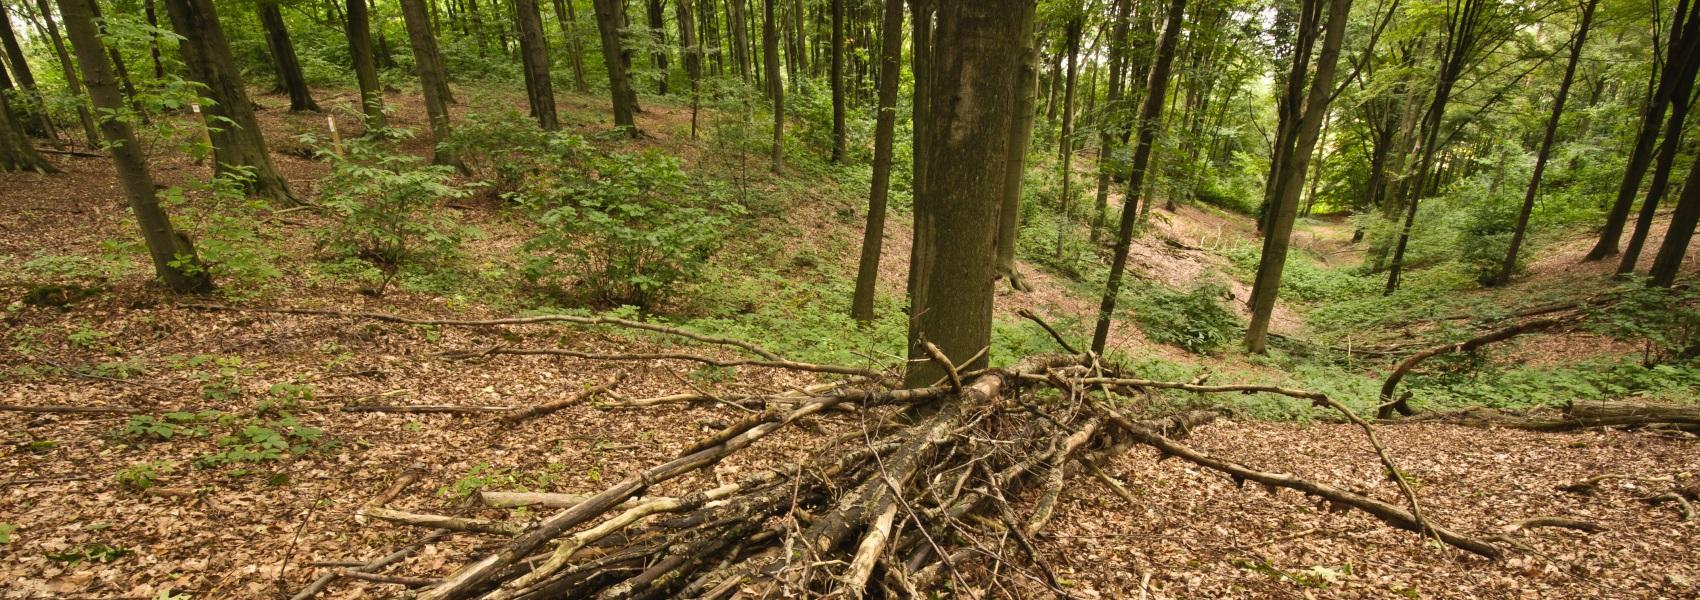 hoop takken in het bos